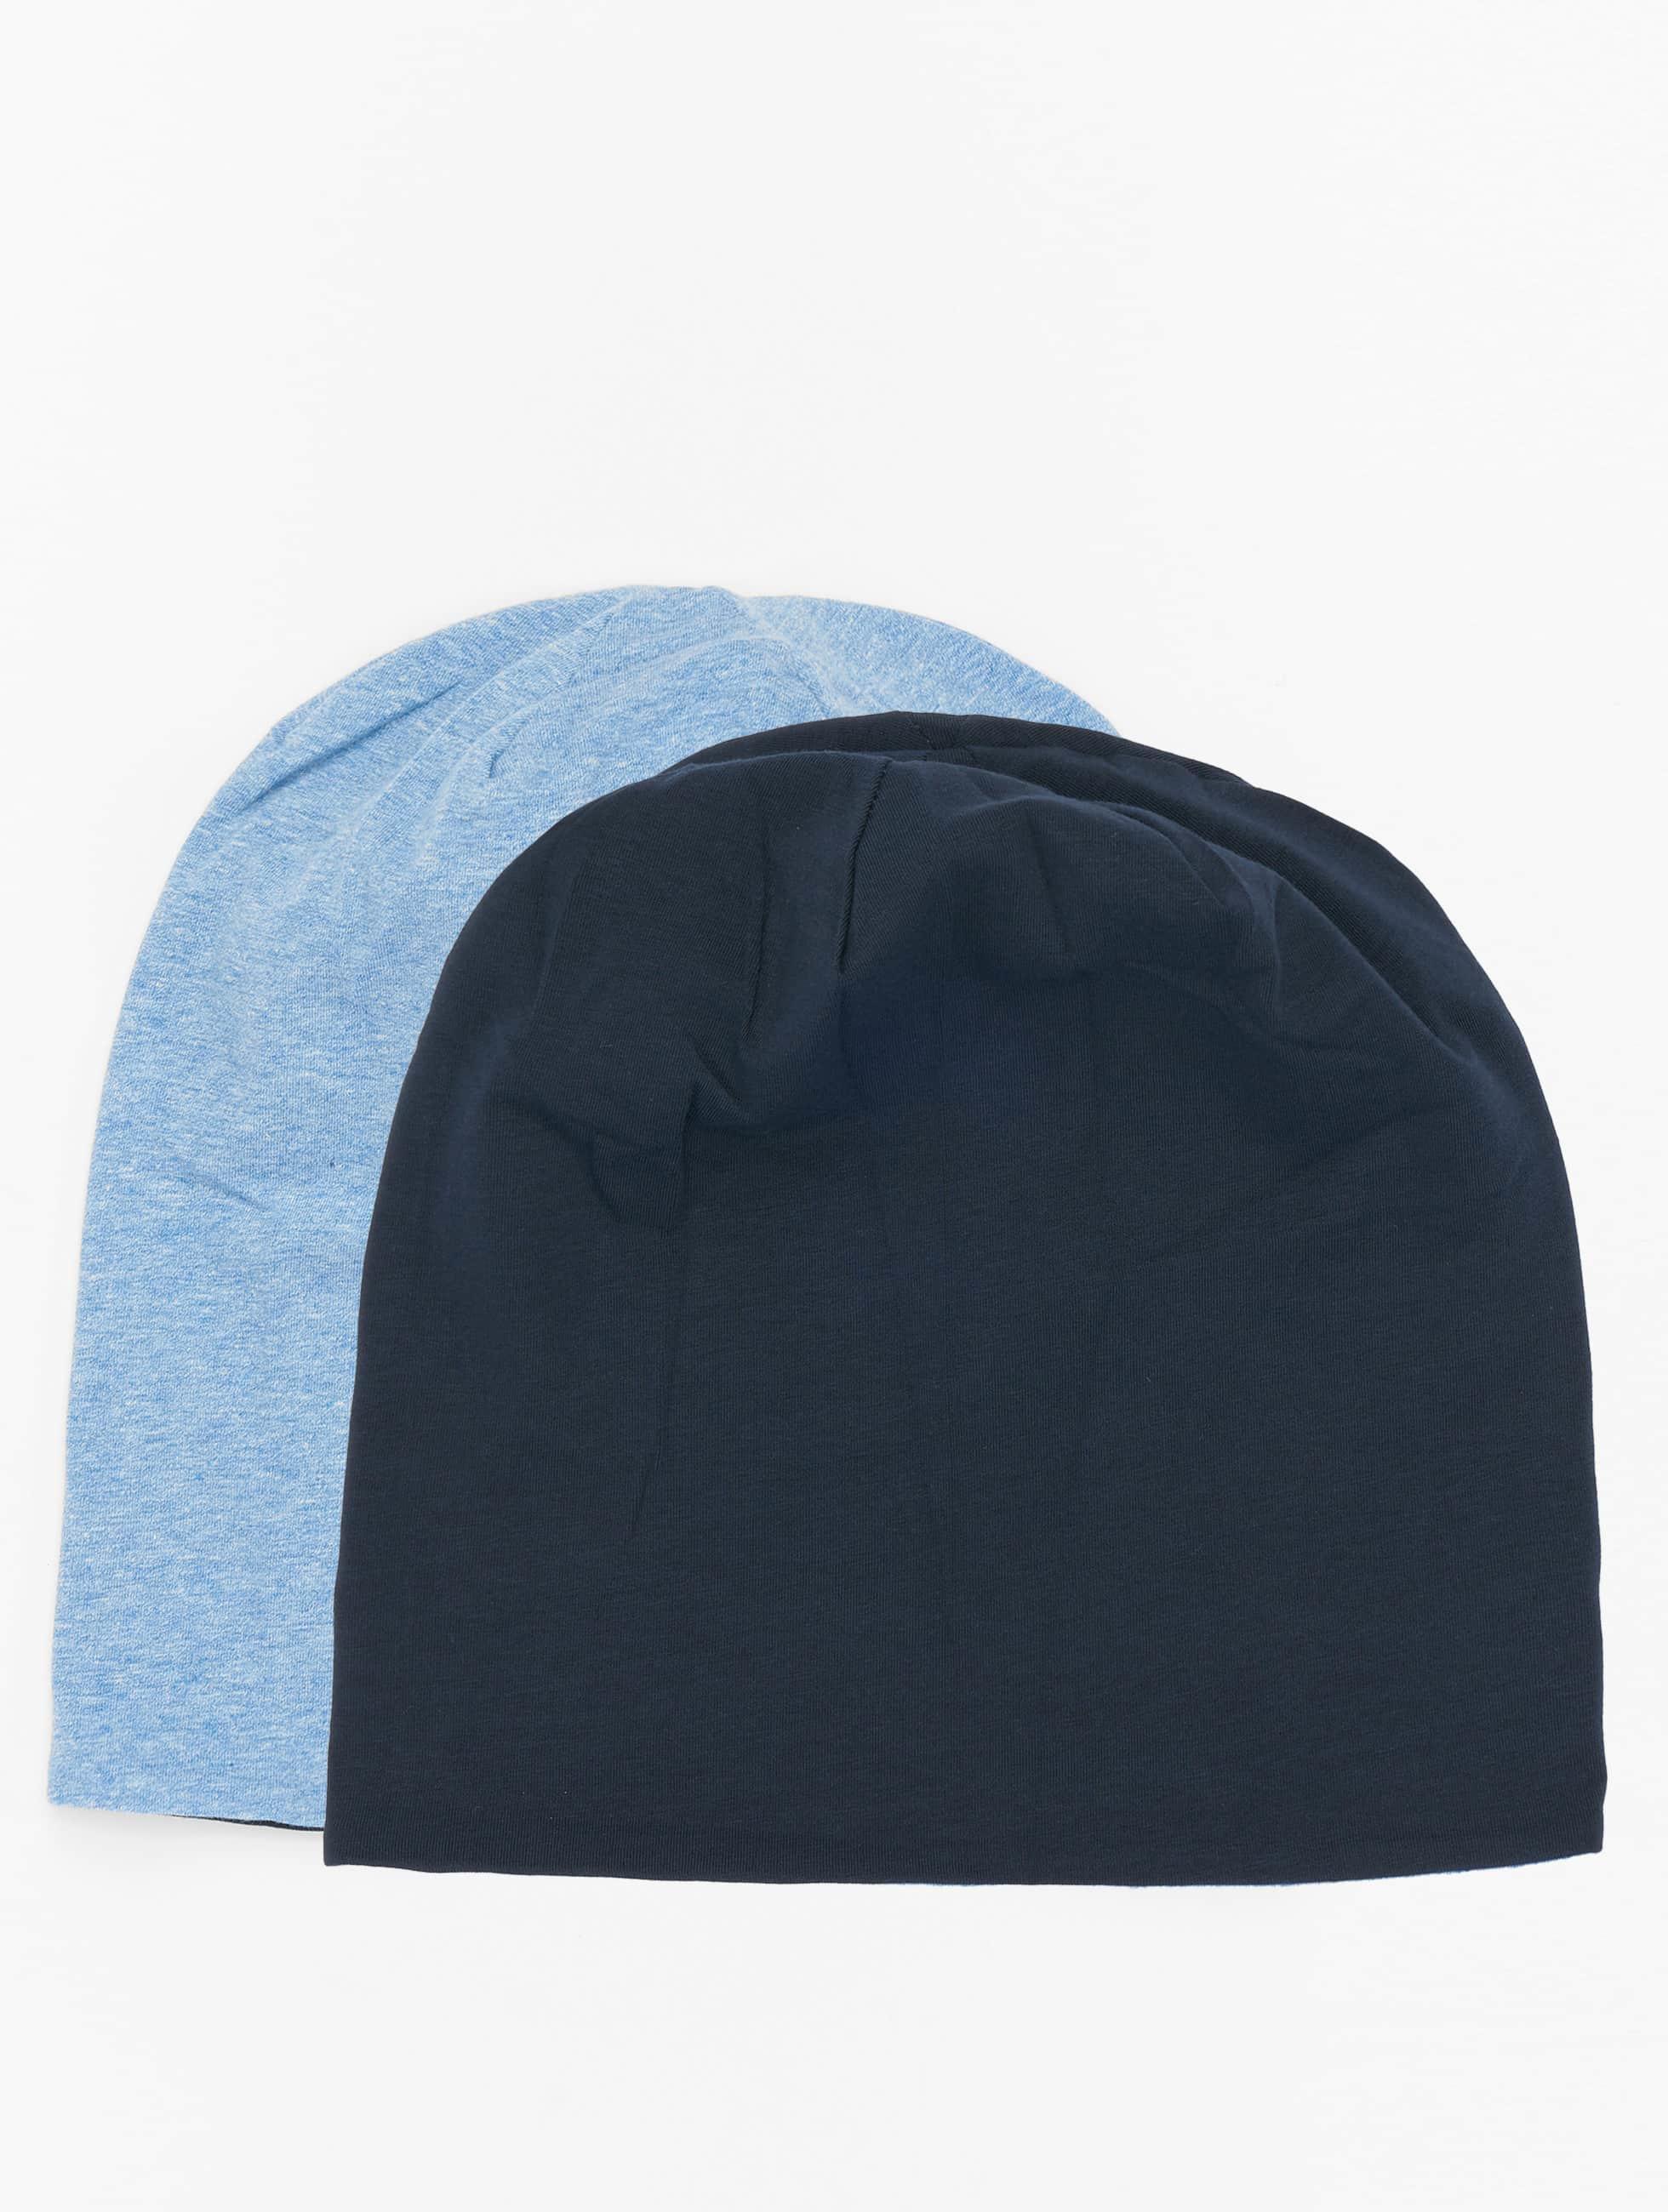 MSTRDS шляпа Jersey Reversible синий